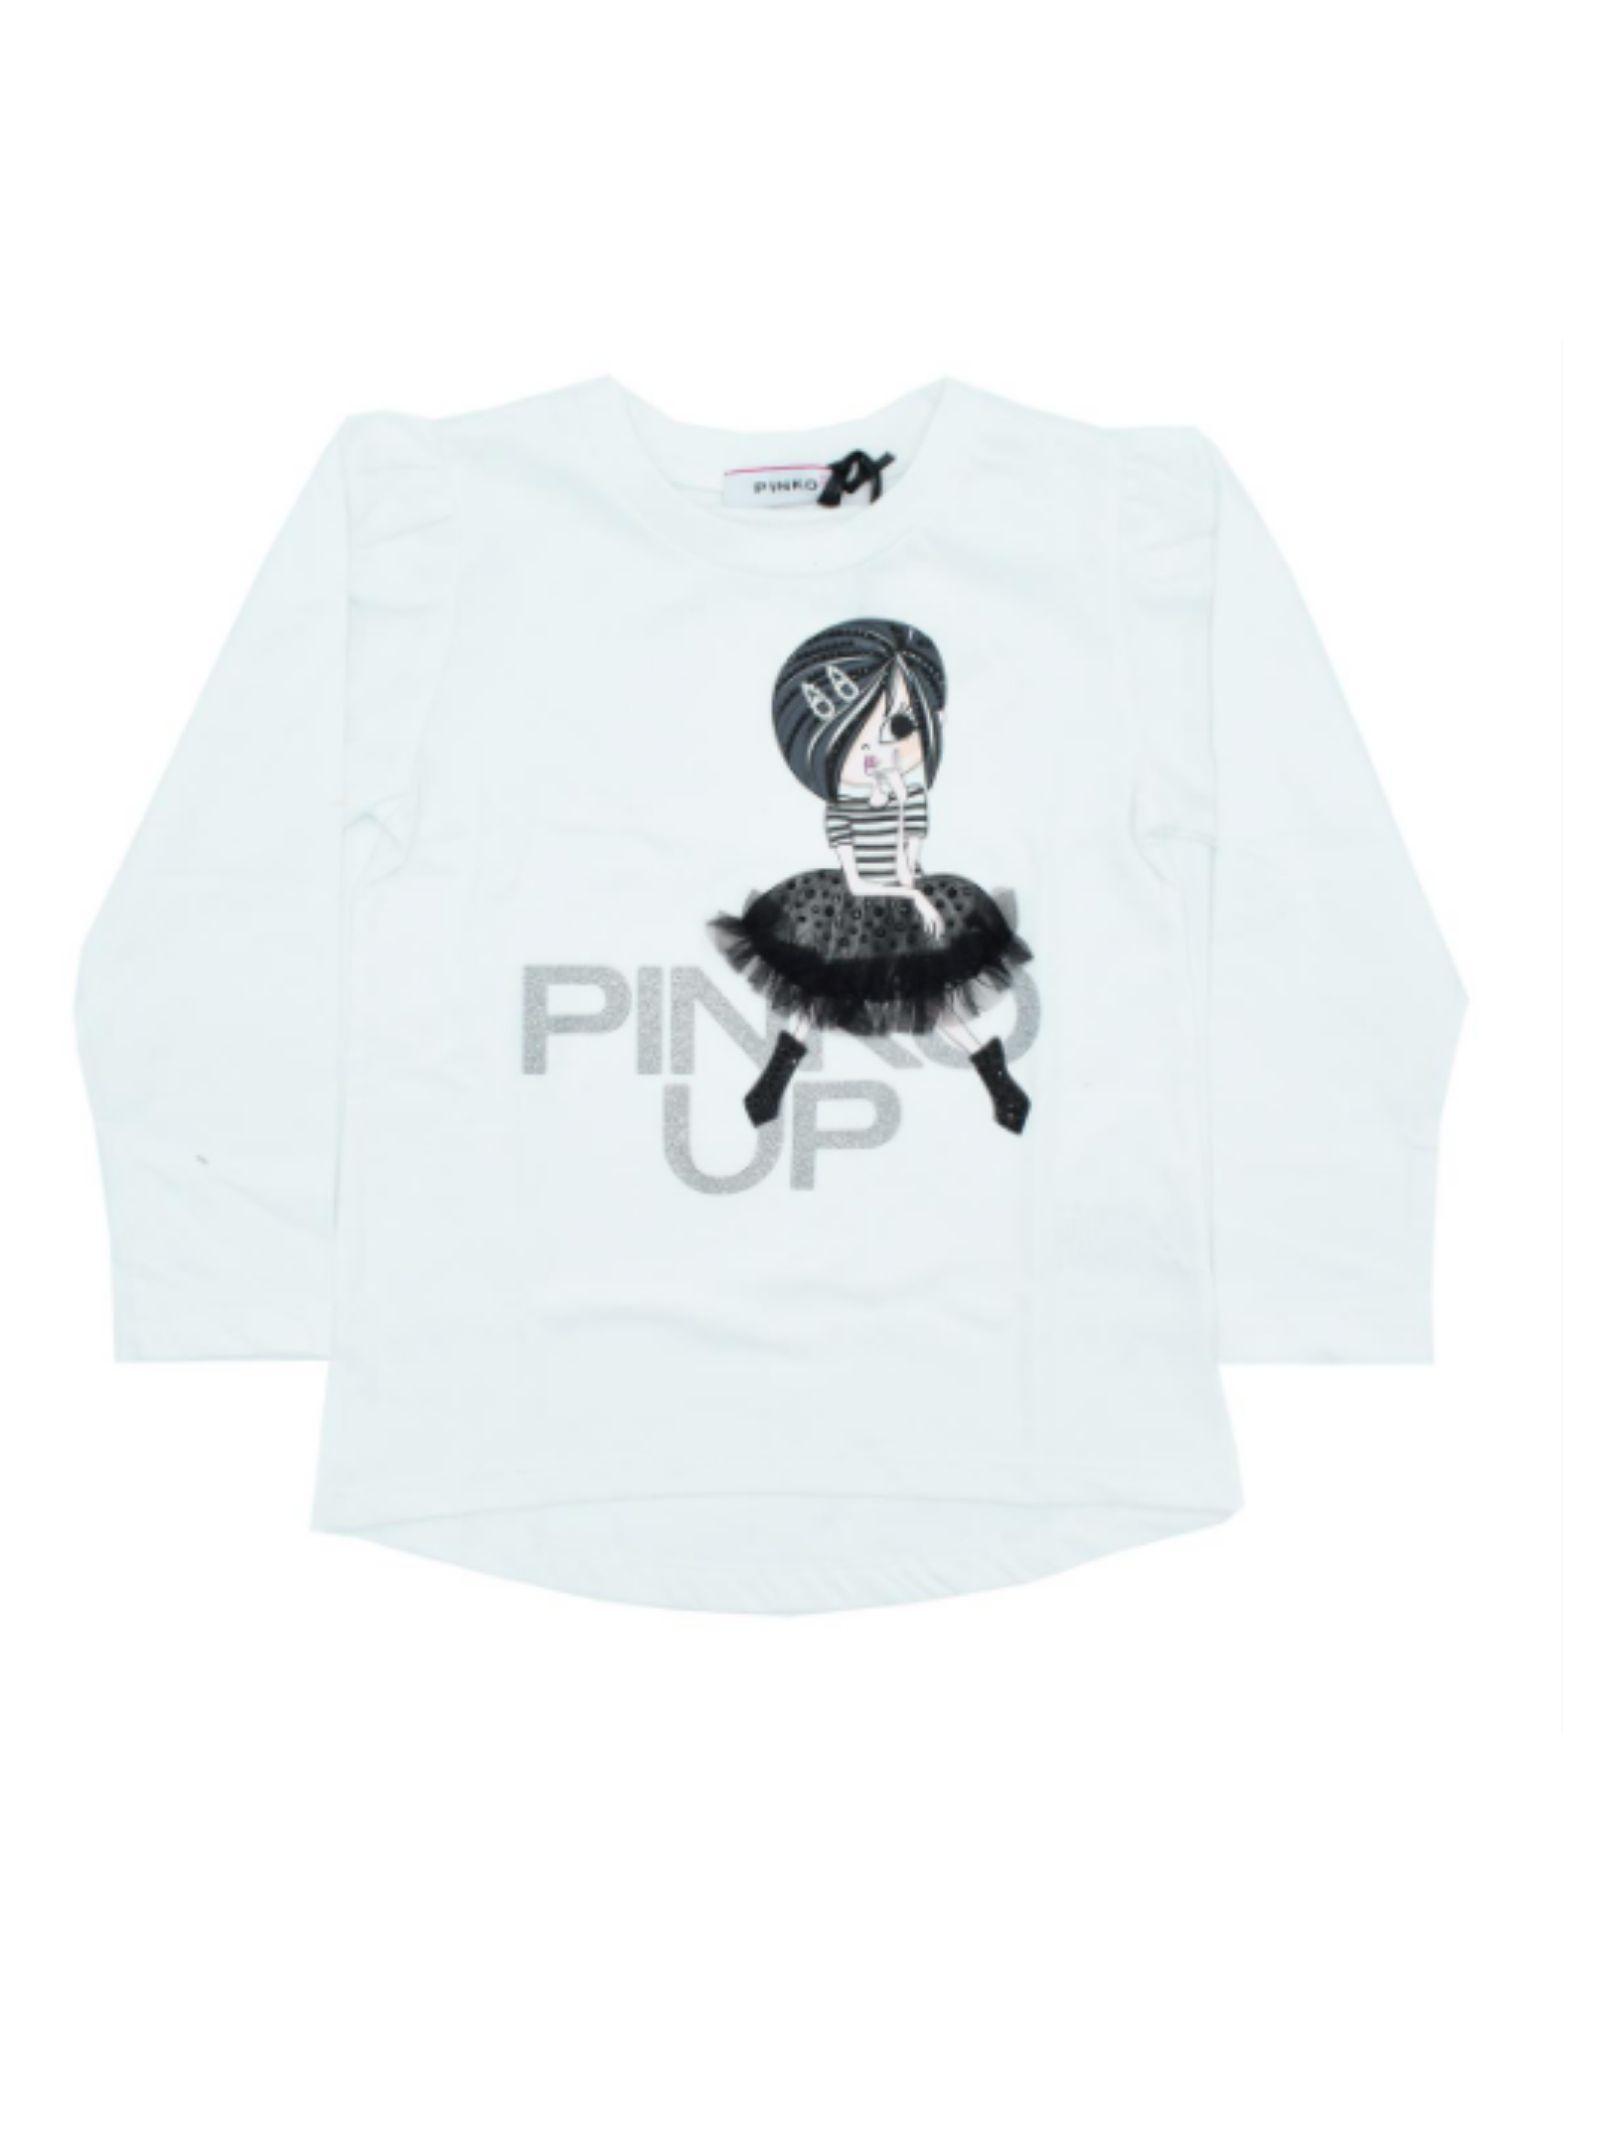 T-shirt Tulle Bambina PINKO UP | T-shirt | 028727002